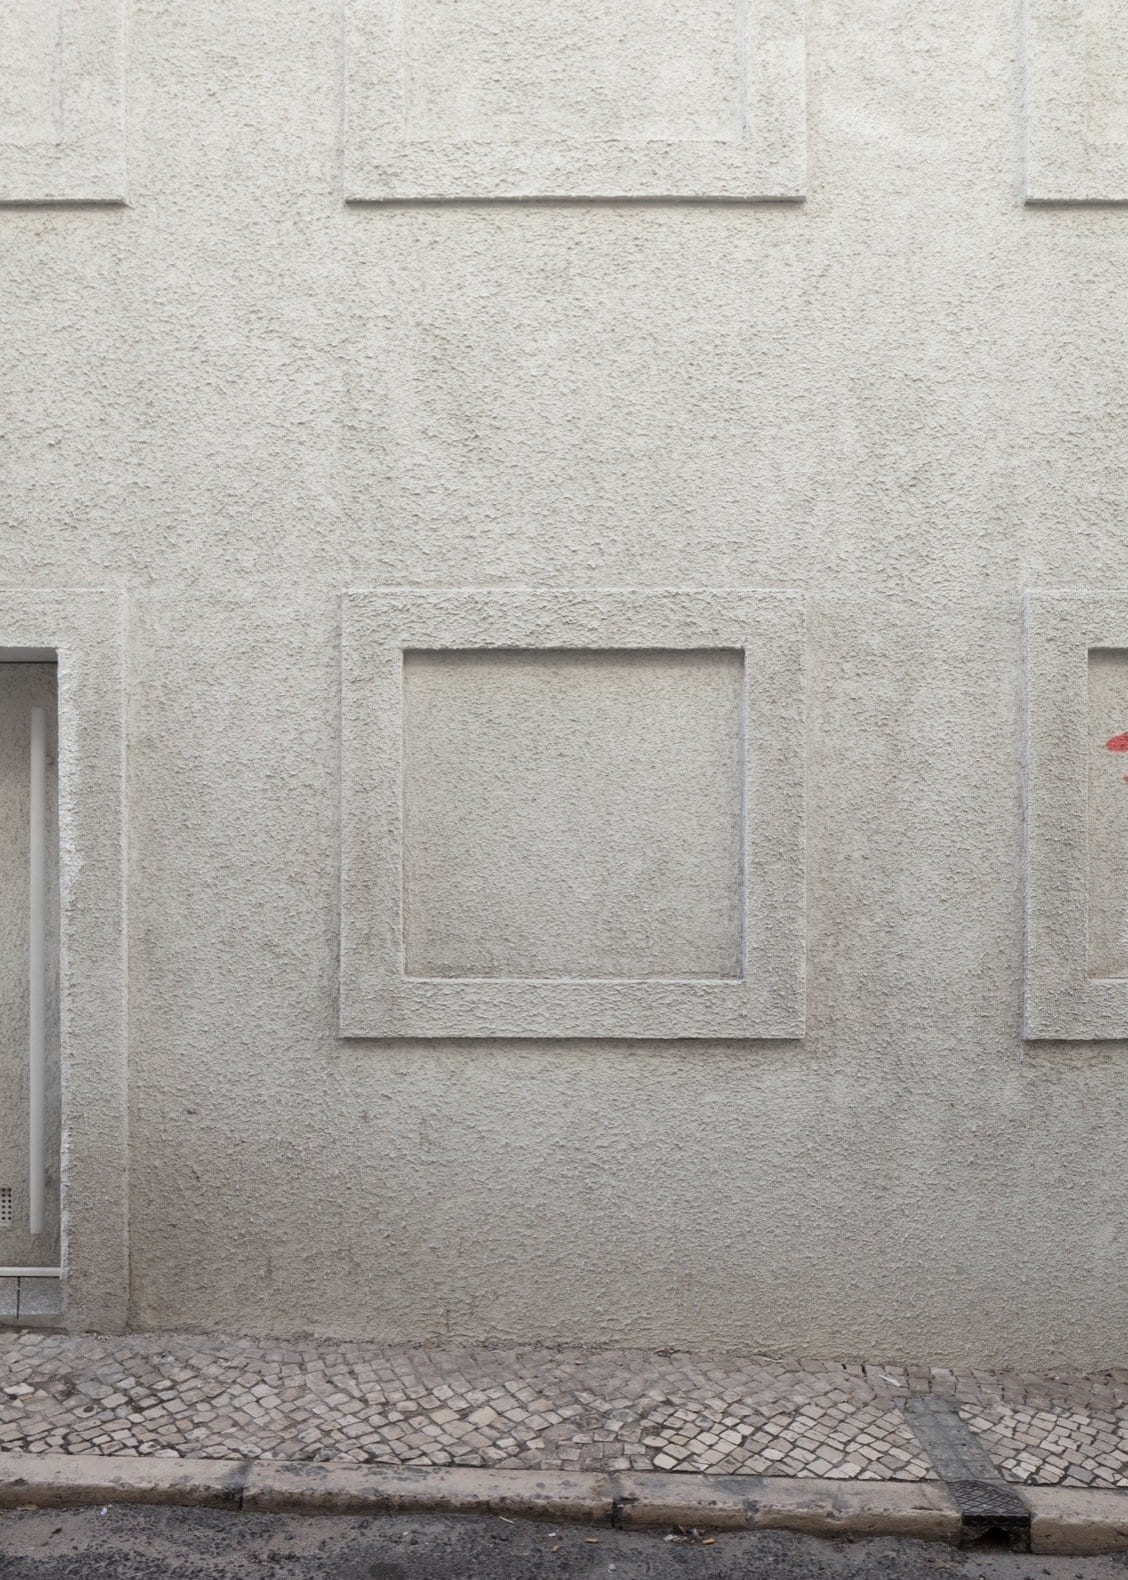 Dodged House In Lisbon By Leopold Banchini Daniel Zamarbide Yellowtrace 06